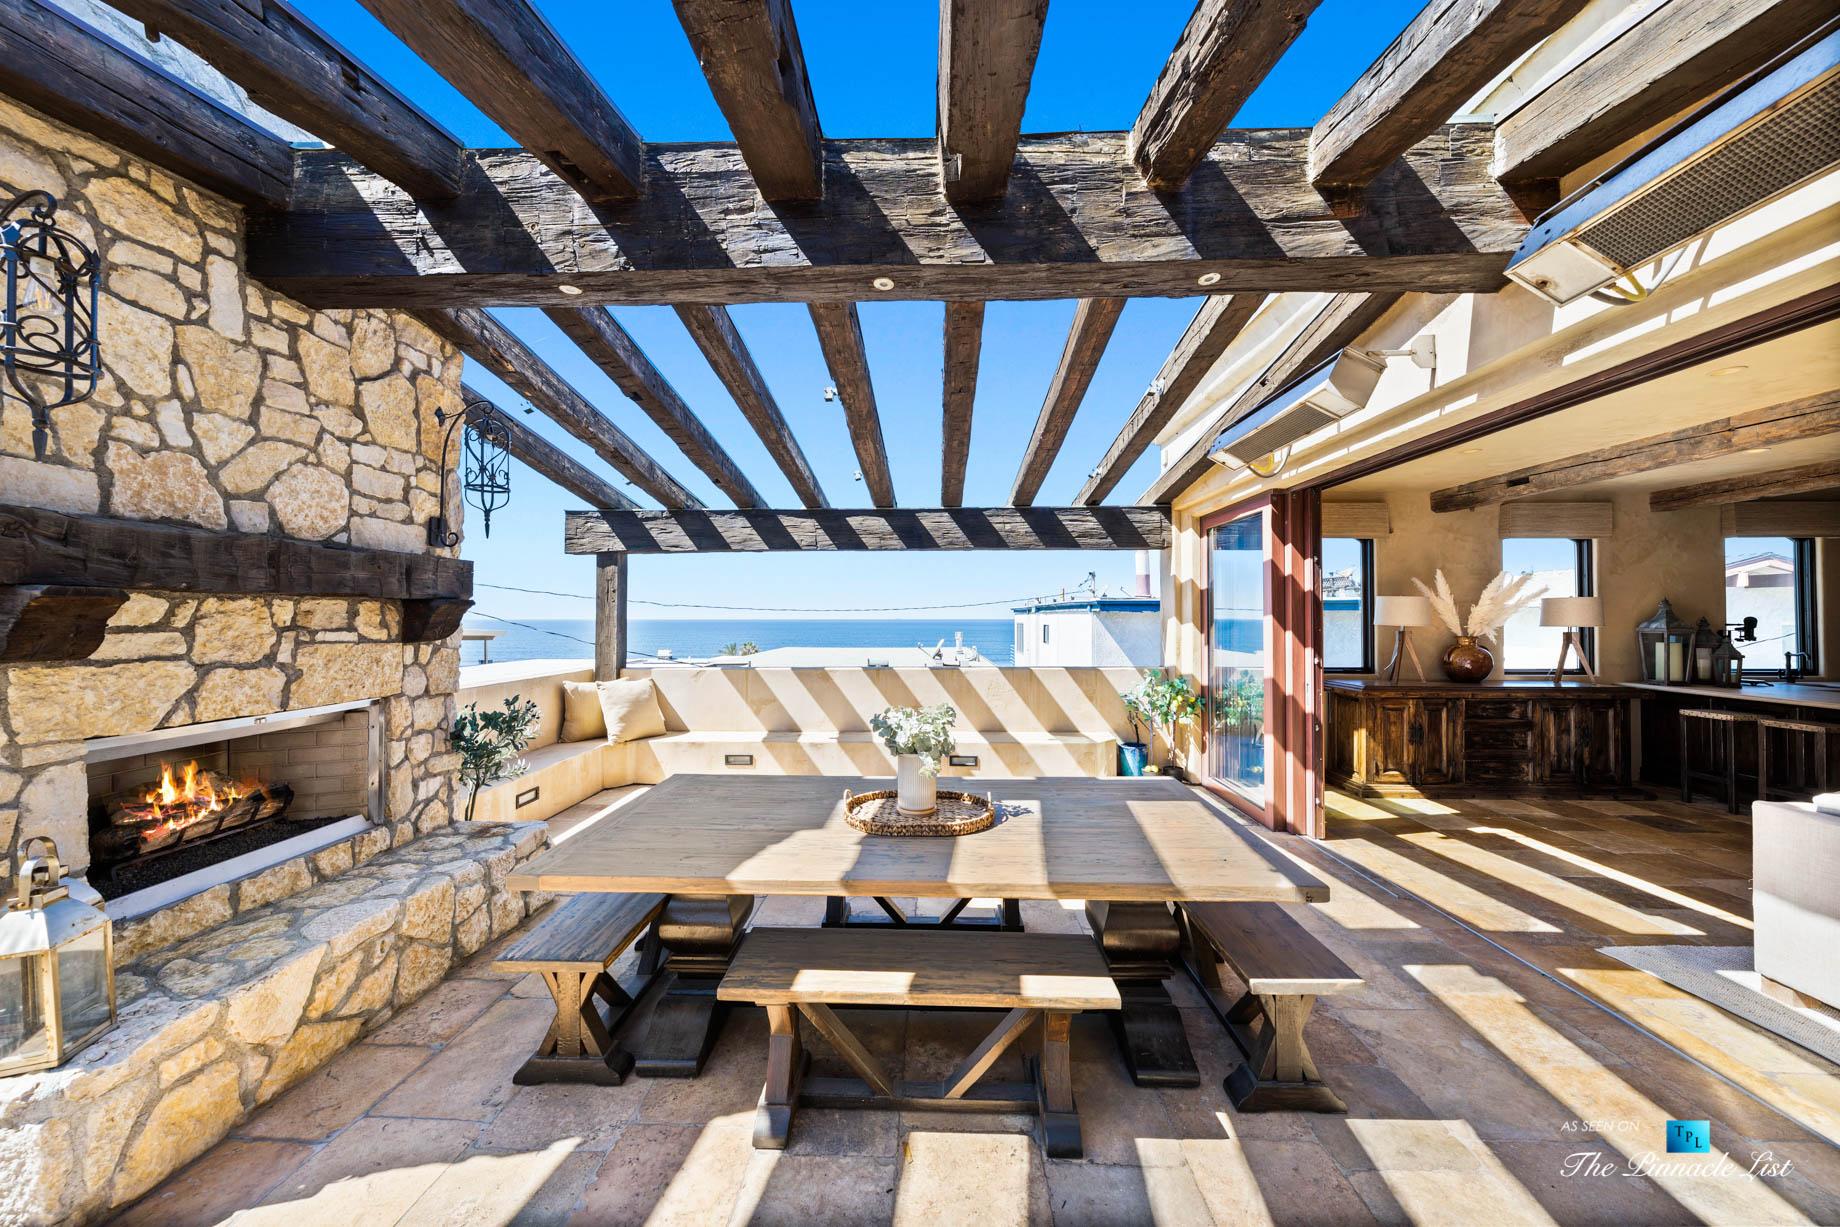 216 7th St, Manhattan Beach, CA, USA - Luxury Real Estate - Coastal Villa Home - Oceanview Outdoor Balcony Lounge